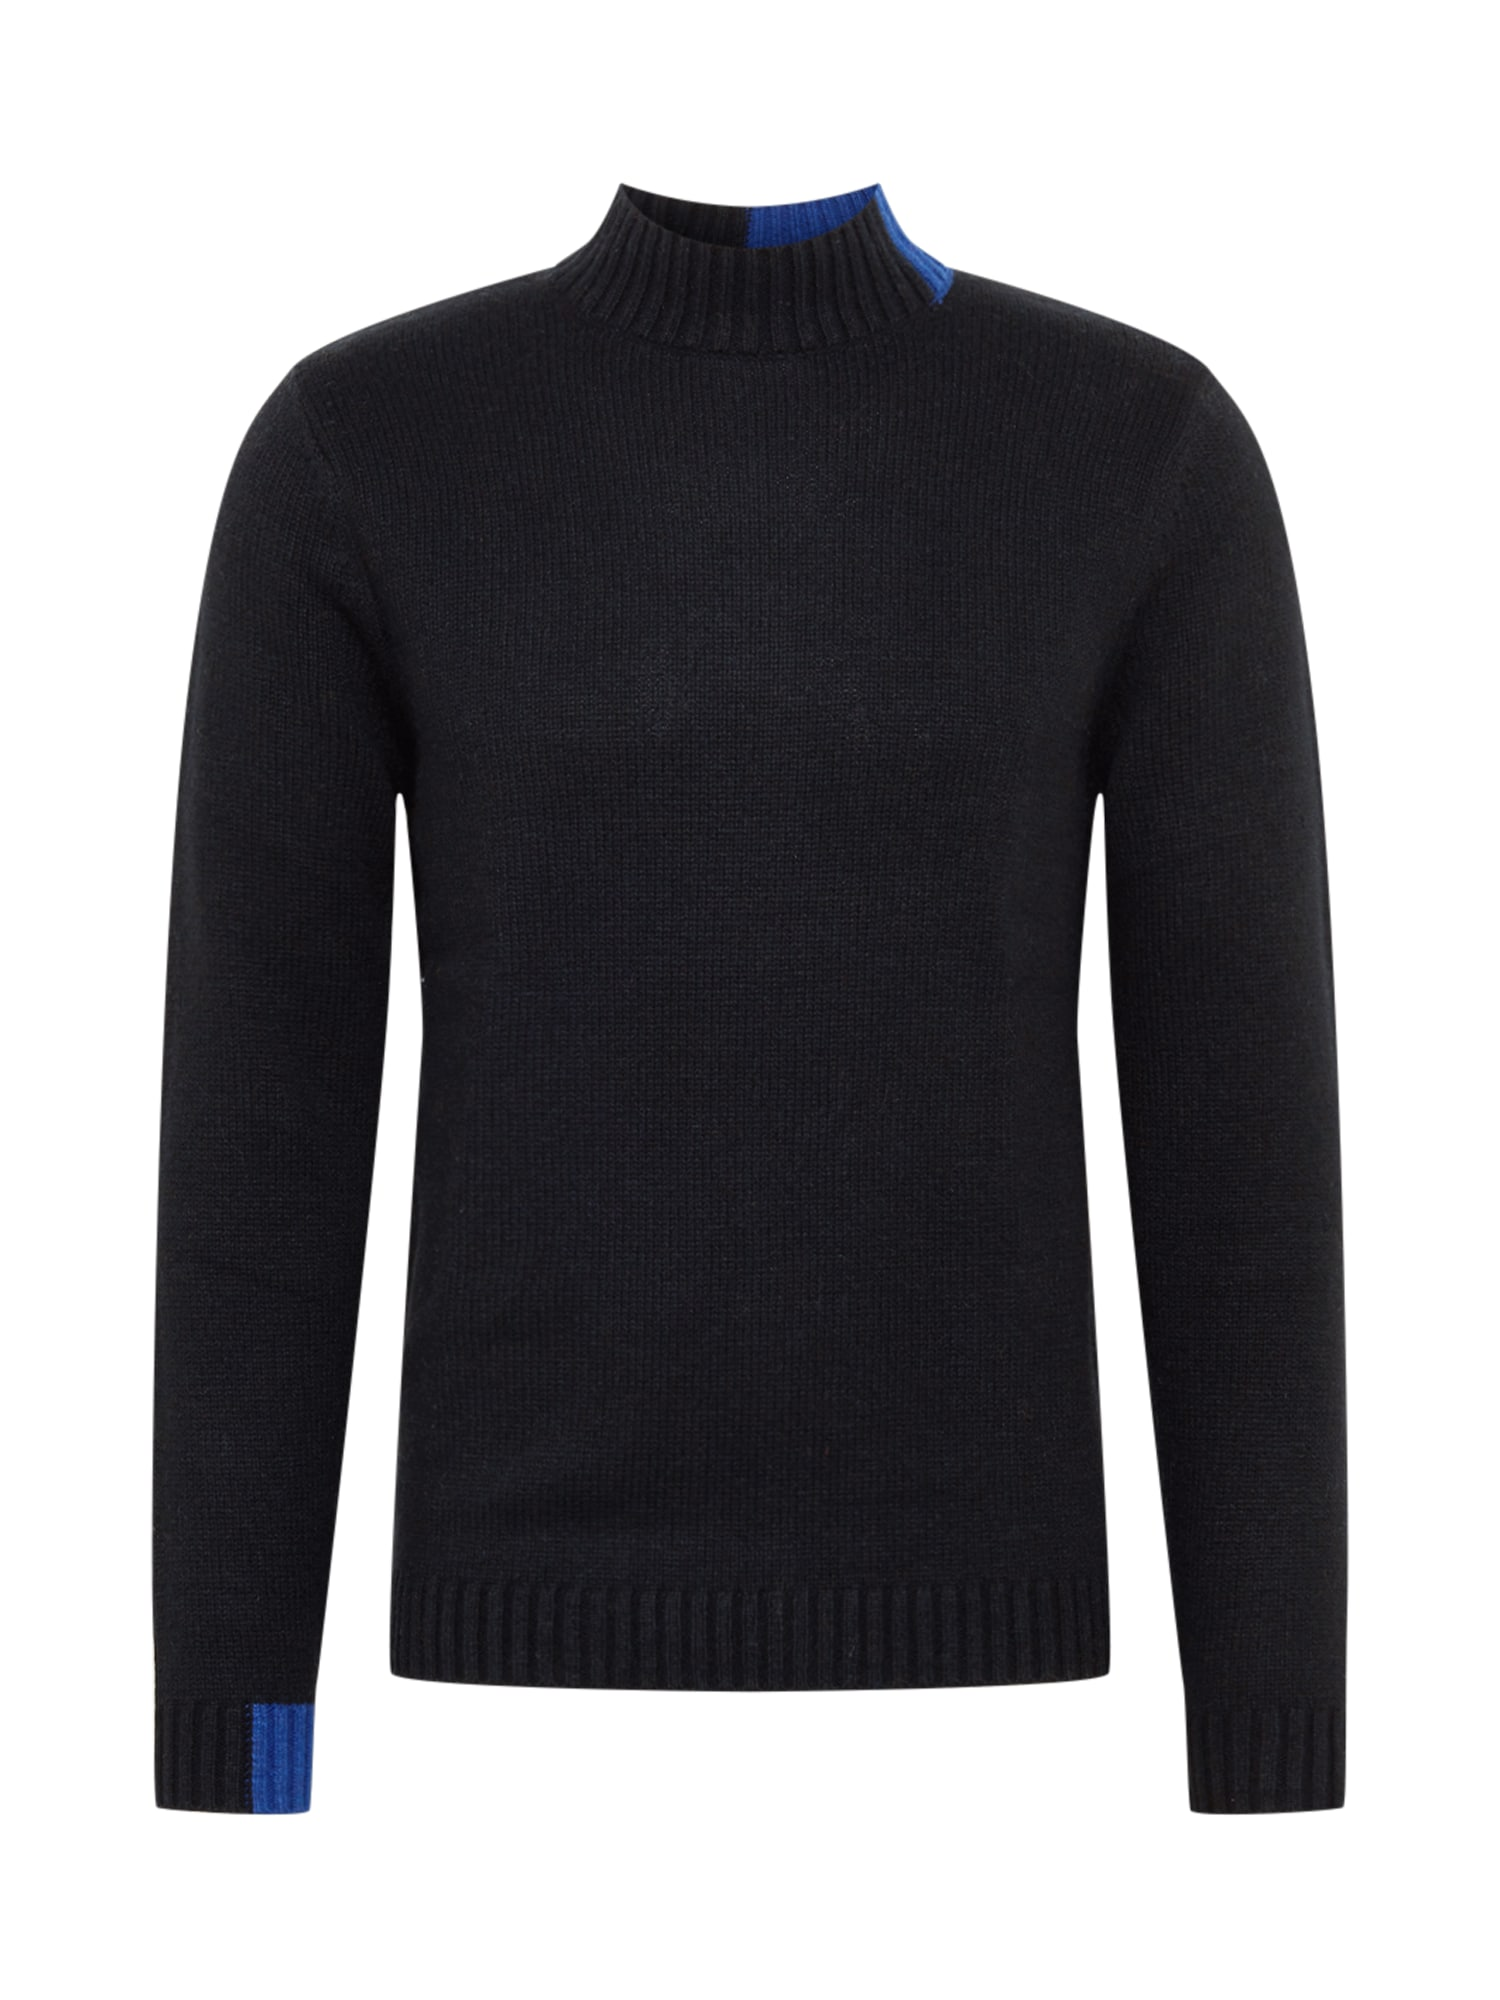 ANTONY MORATO Megztinis juoda / mėlyna